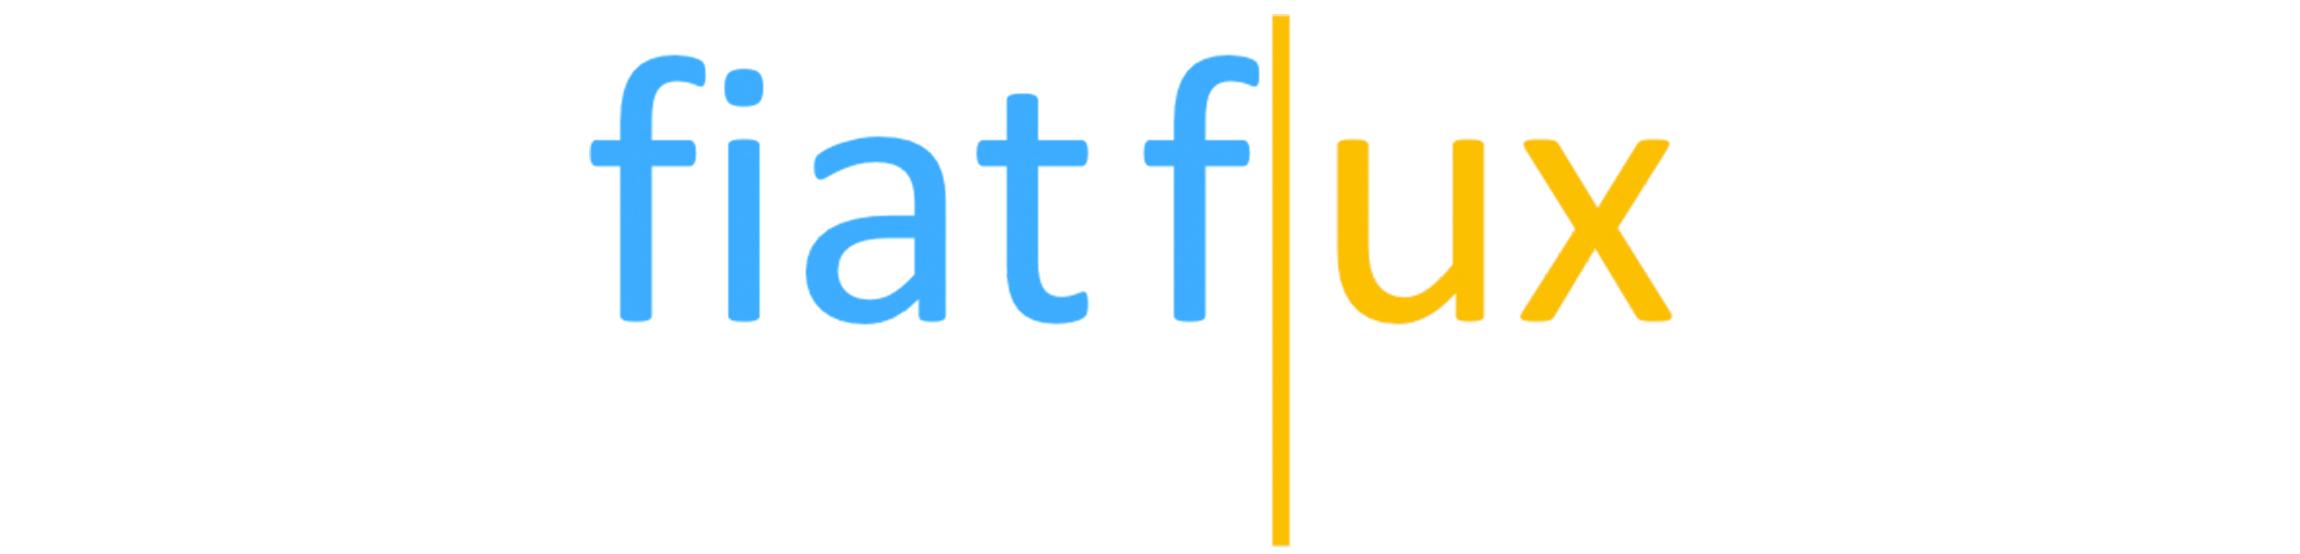 fiatflux_resized.png